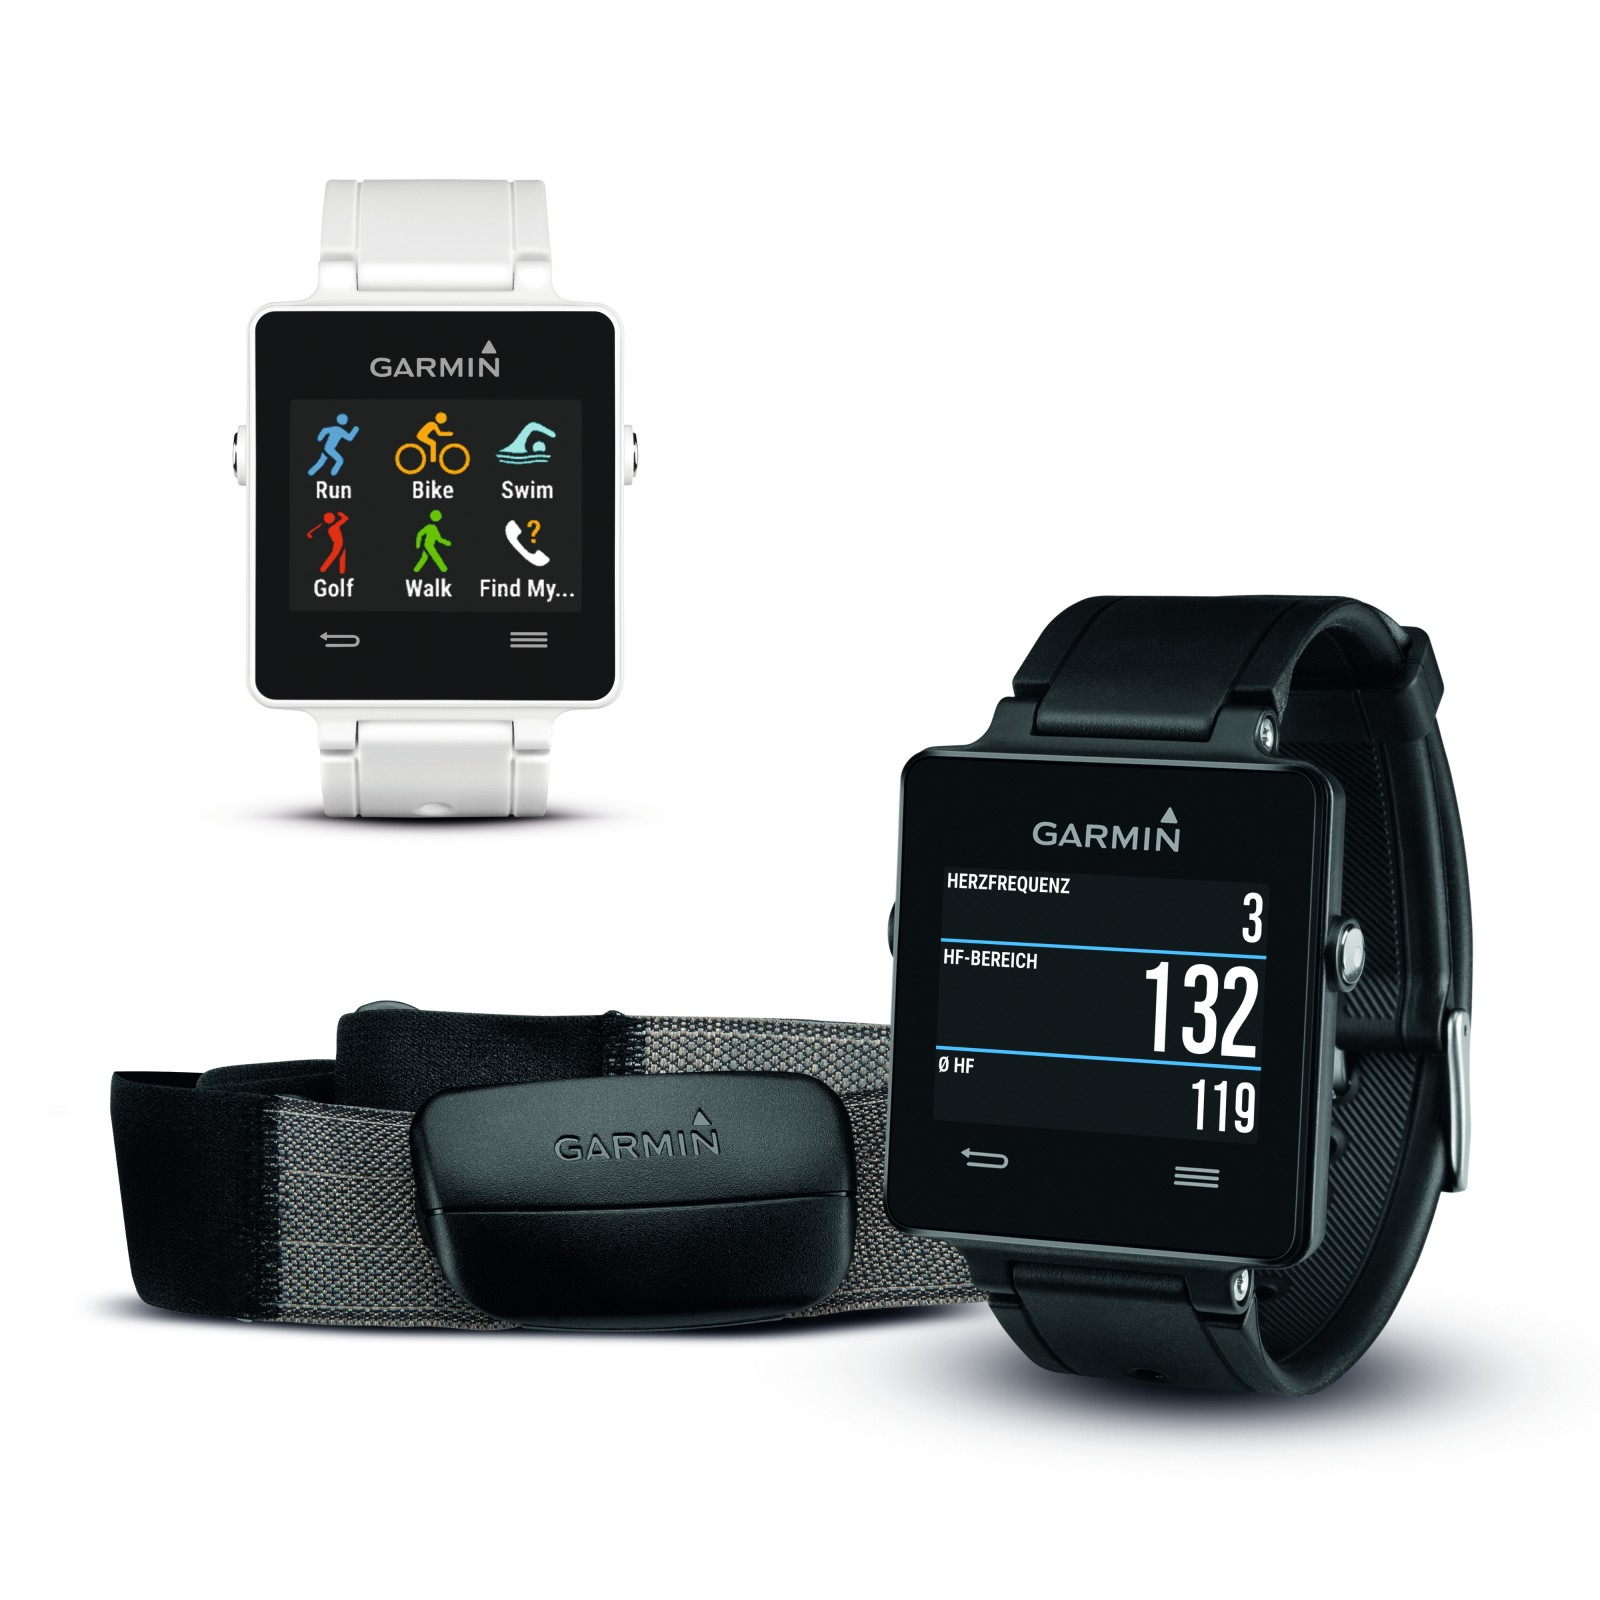 Garmin vivoactive GPS-Smartwatch best buy at